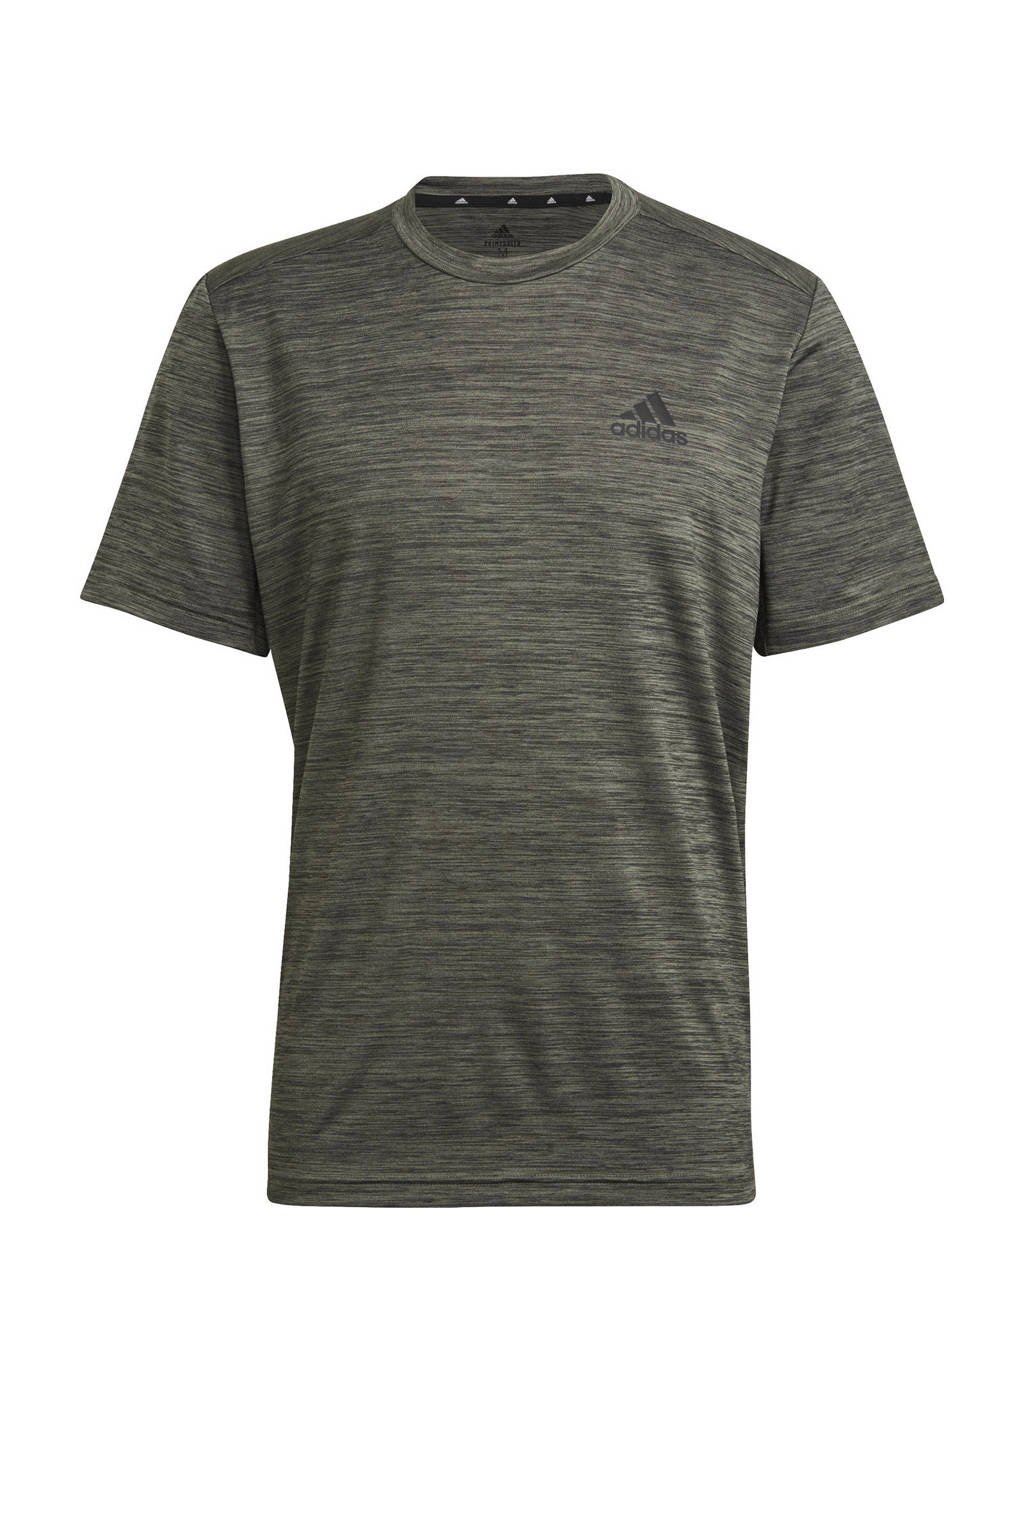 adidas Performance   Designed2Move sport T-shirt kaki, Kaki